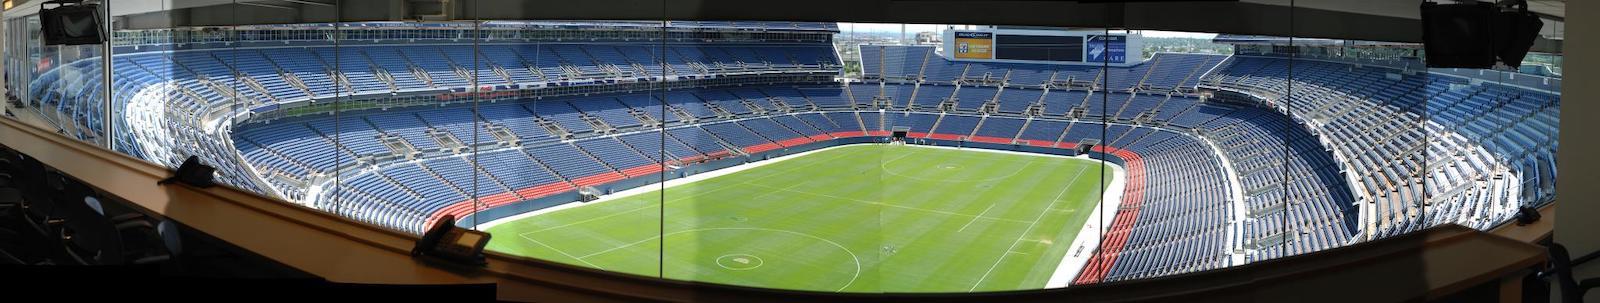 Mile High Stadium Denver CO Press Area View